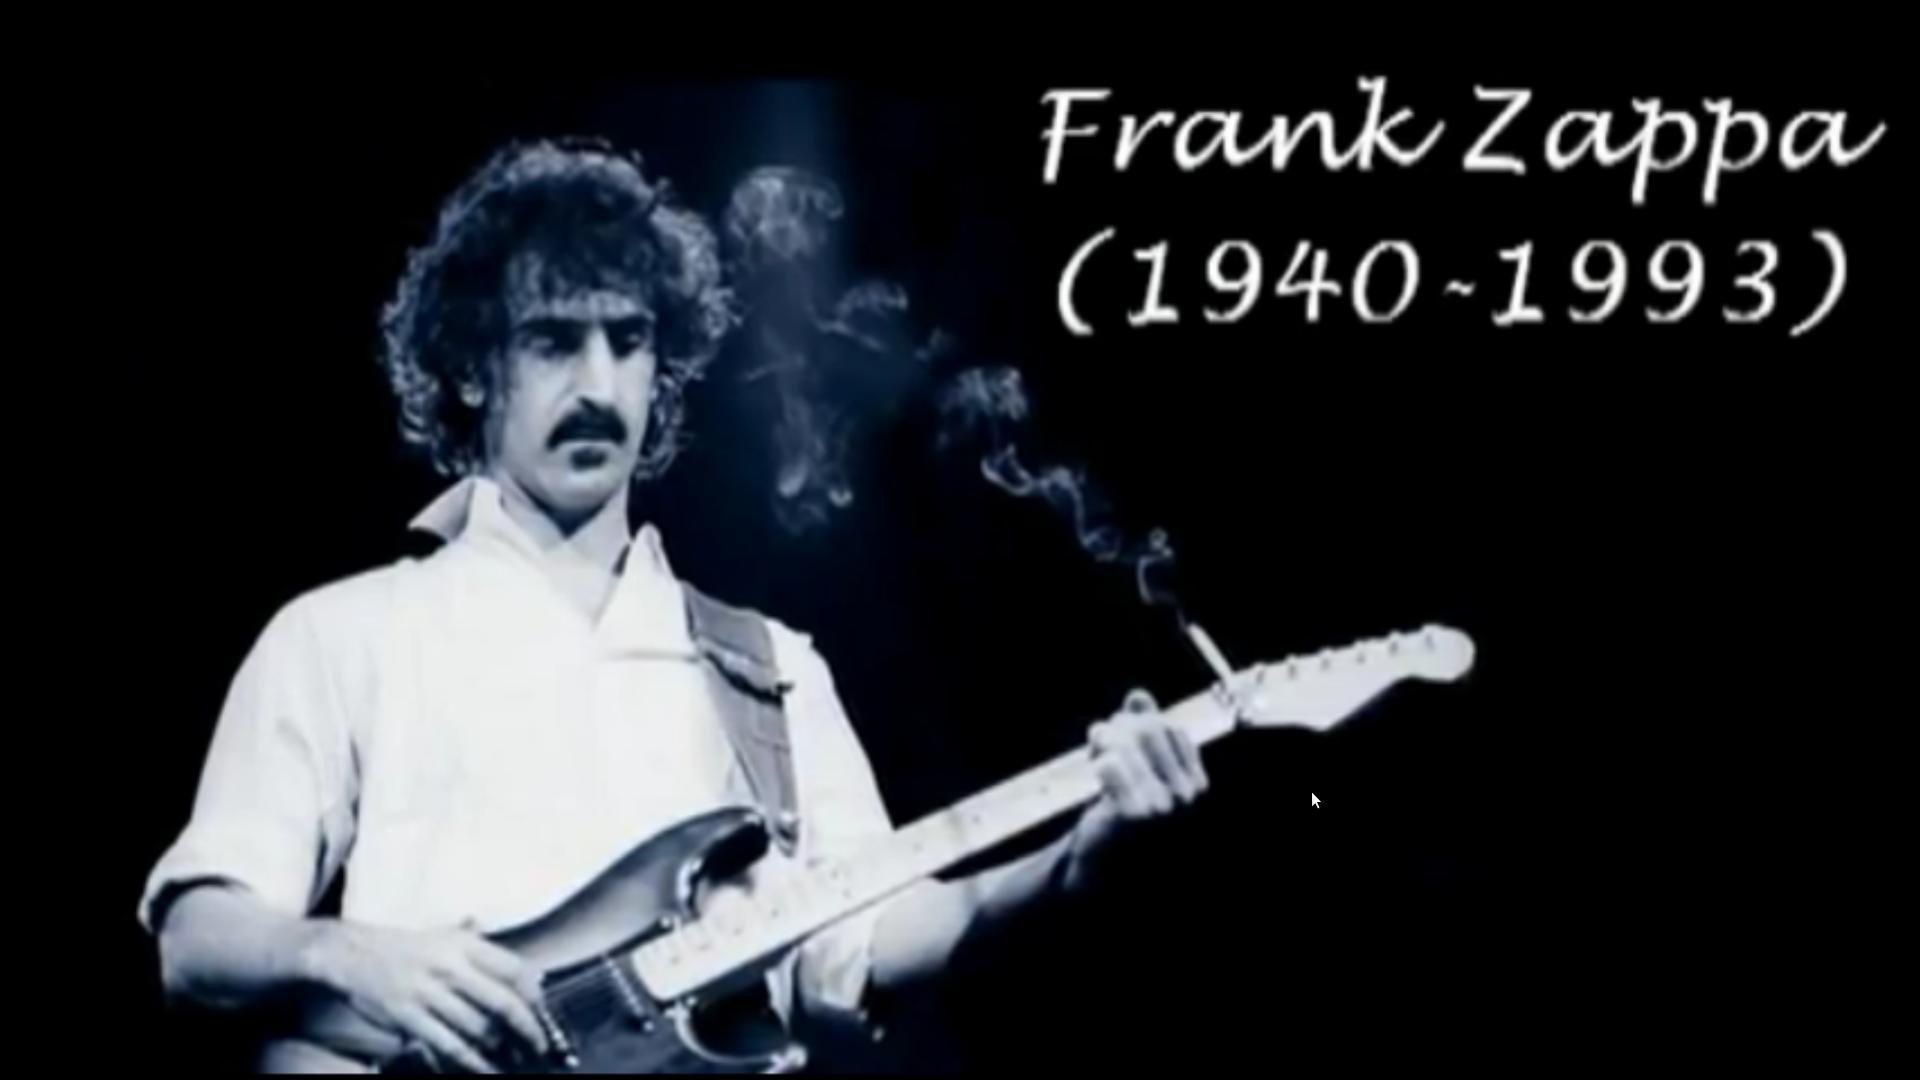 Frank Zappa 1940-1993